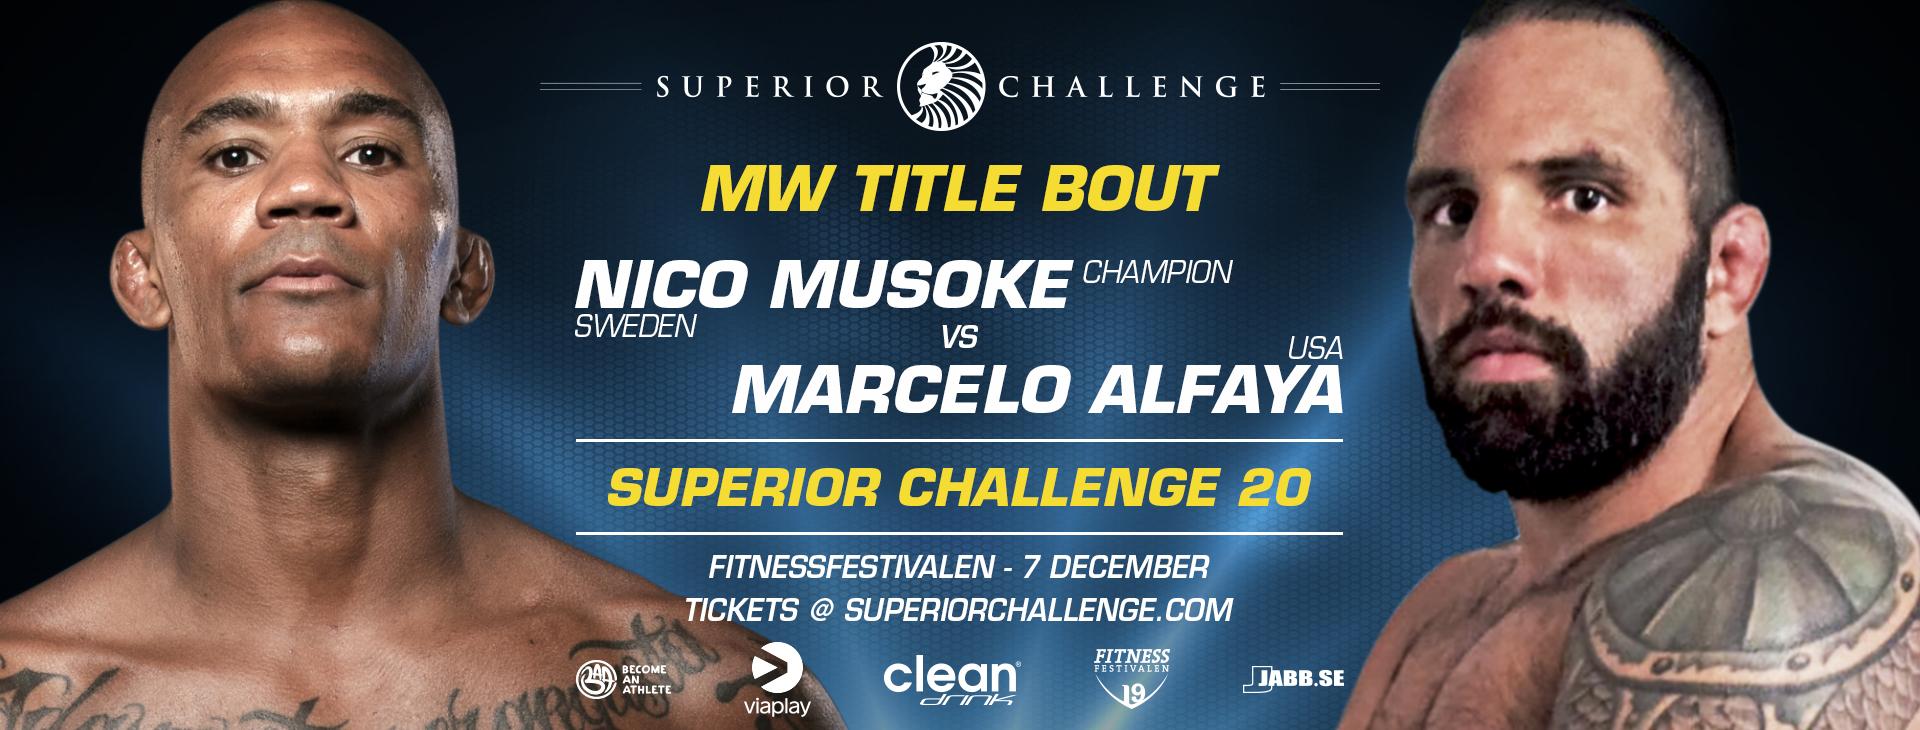 Middleweight title bout Nico Musoke vs Marcelo Alfaya at Superior Challenge 20 - Fitnessfestivalen